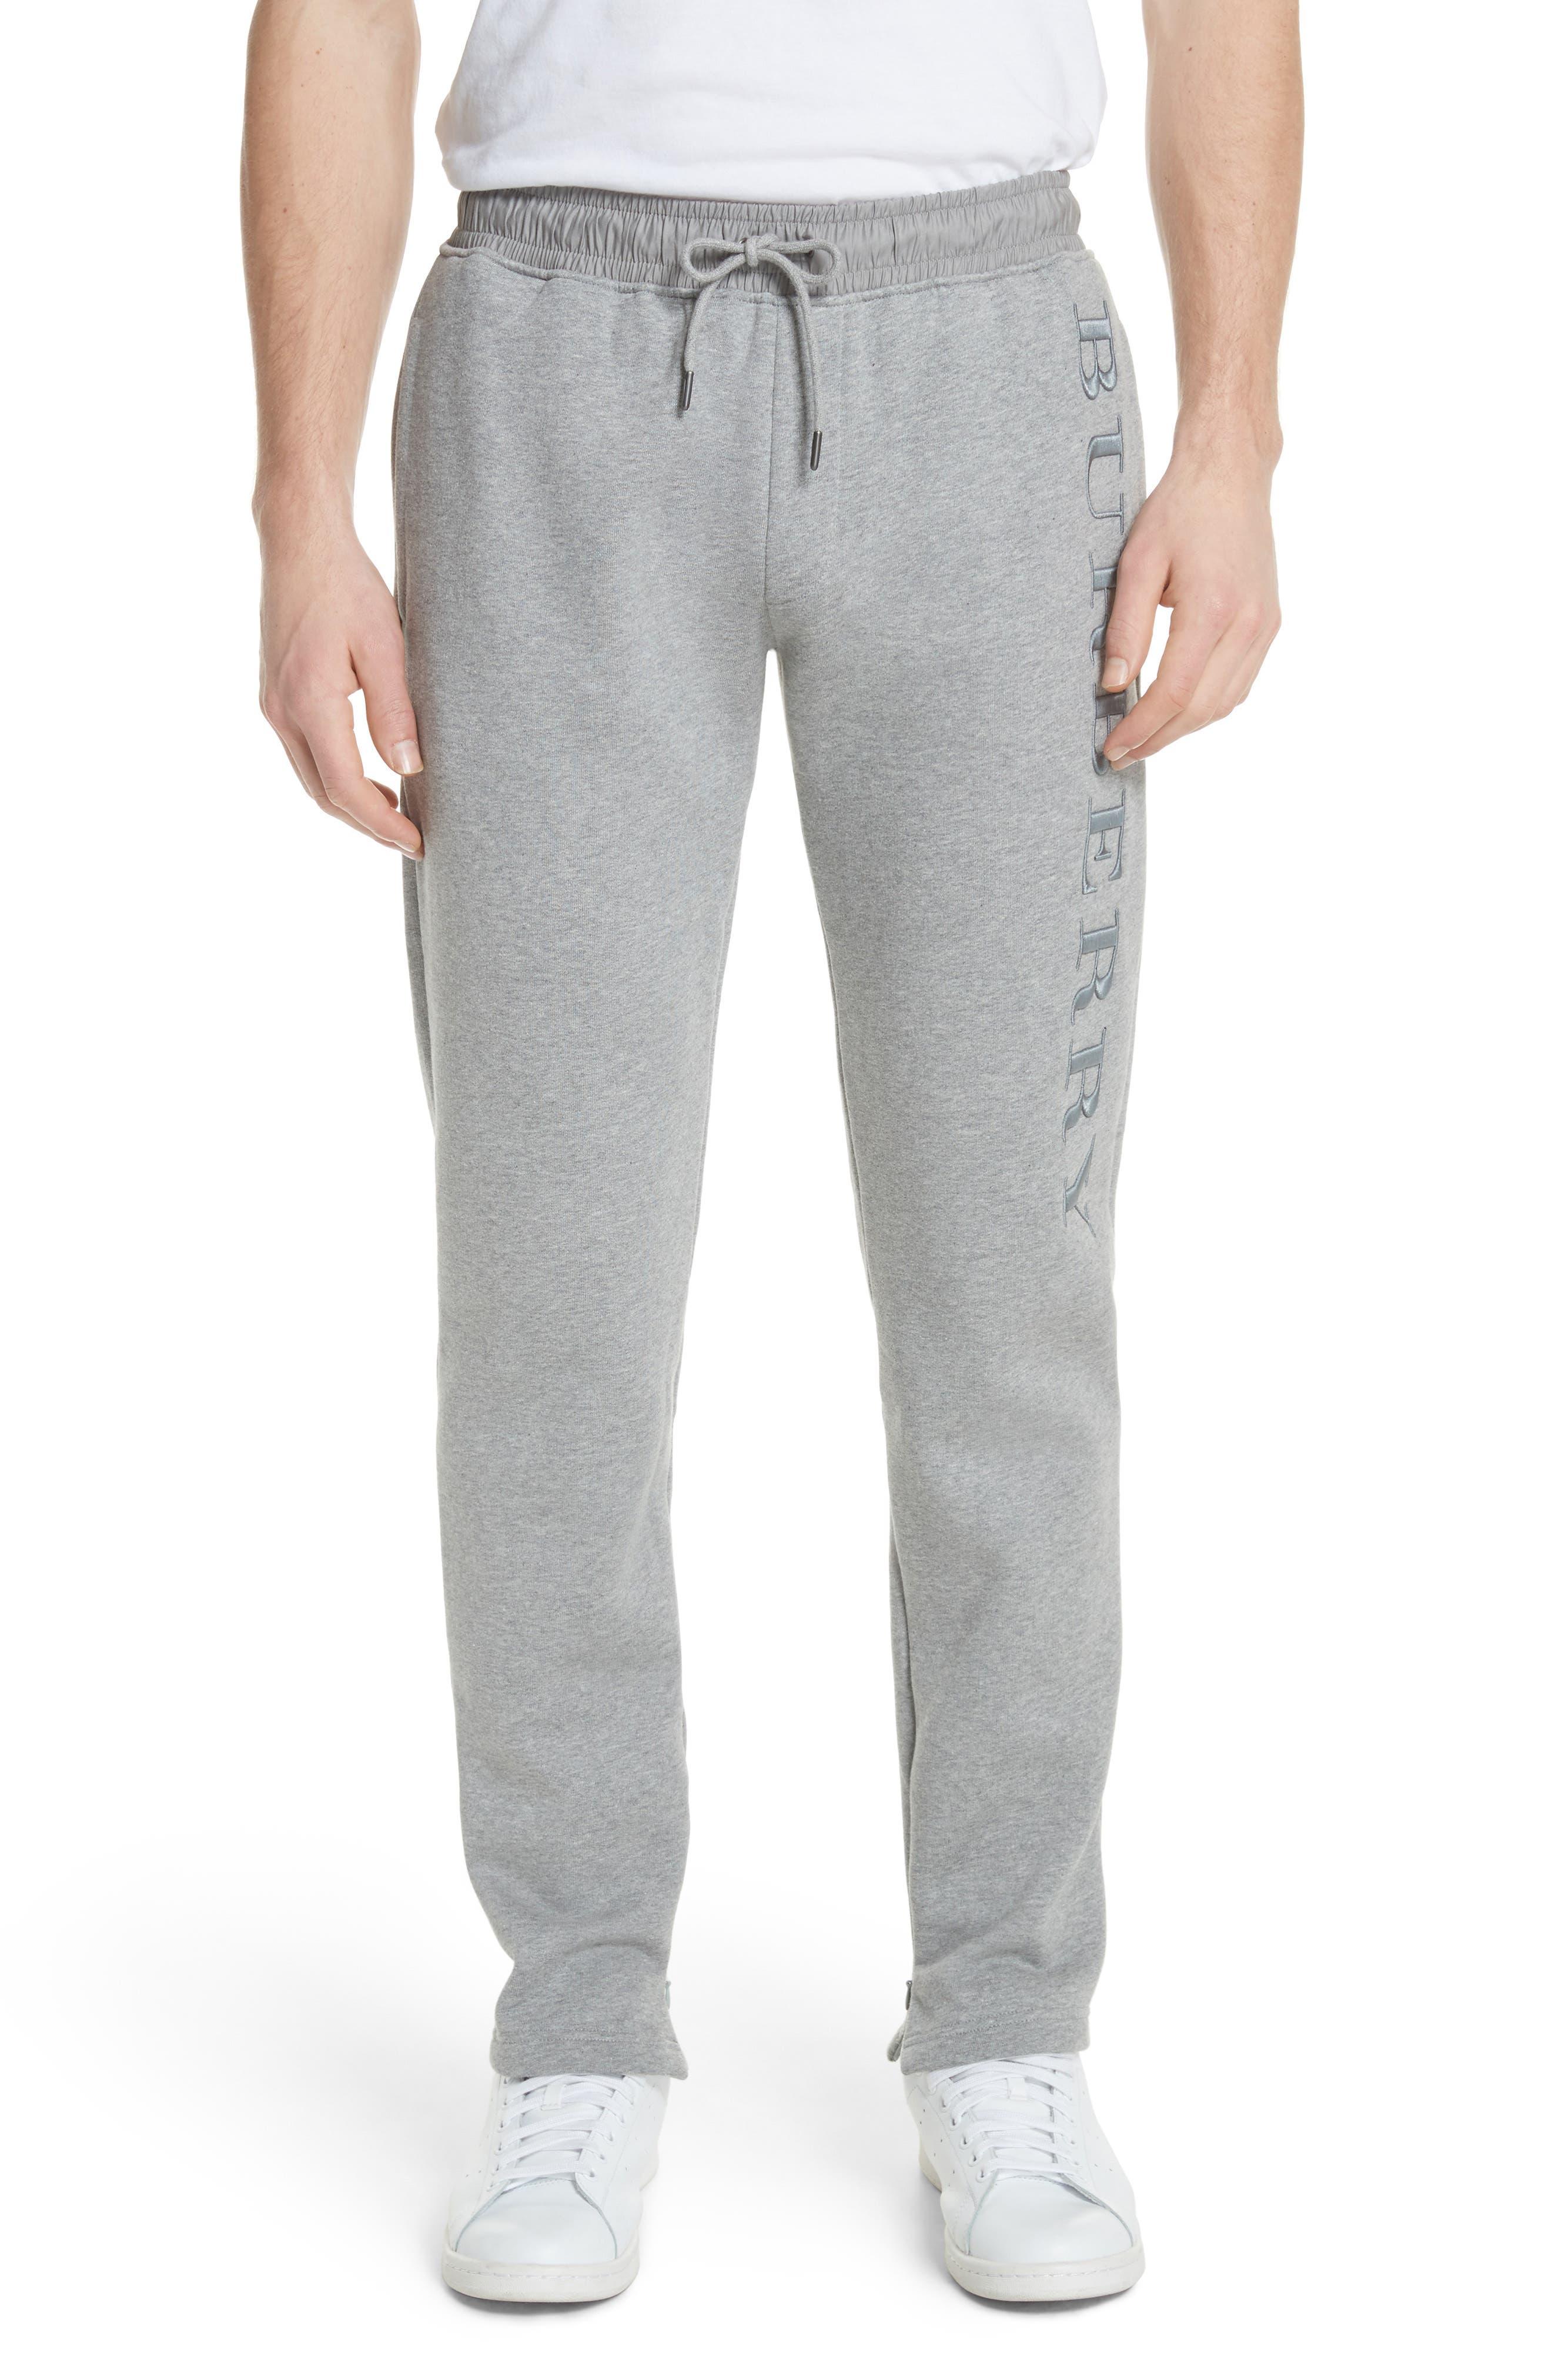 Nickford Lounge Pants,                             Main thumbnail 1, color,                             Pale Grey Melange